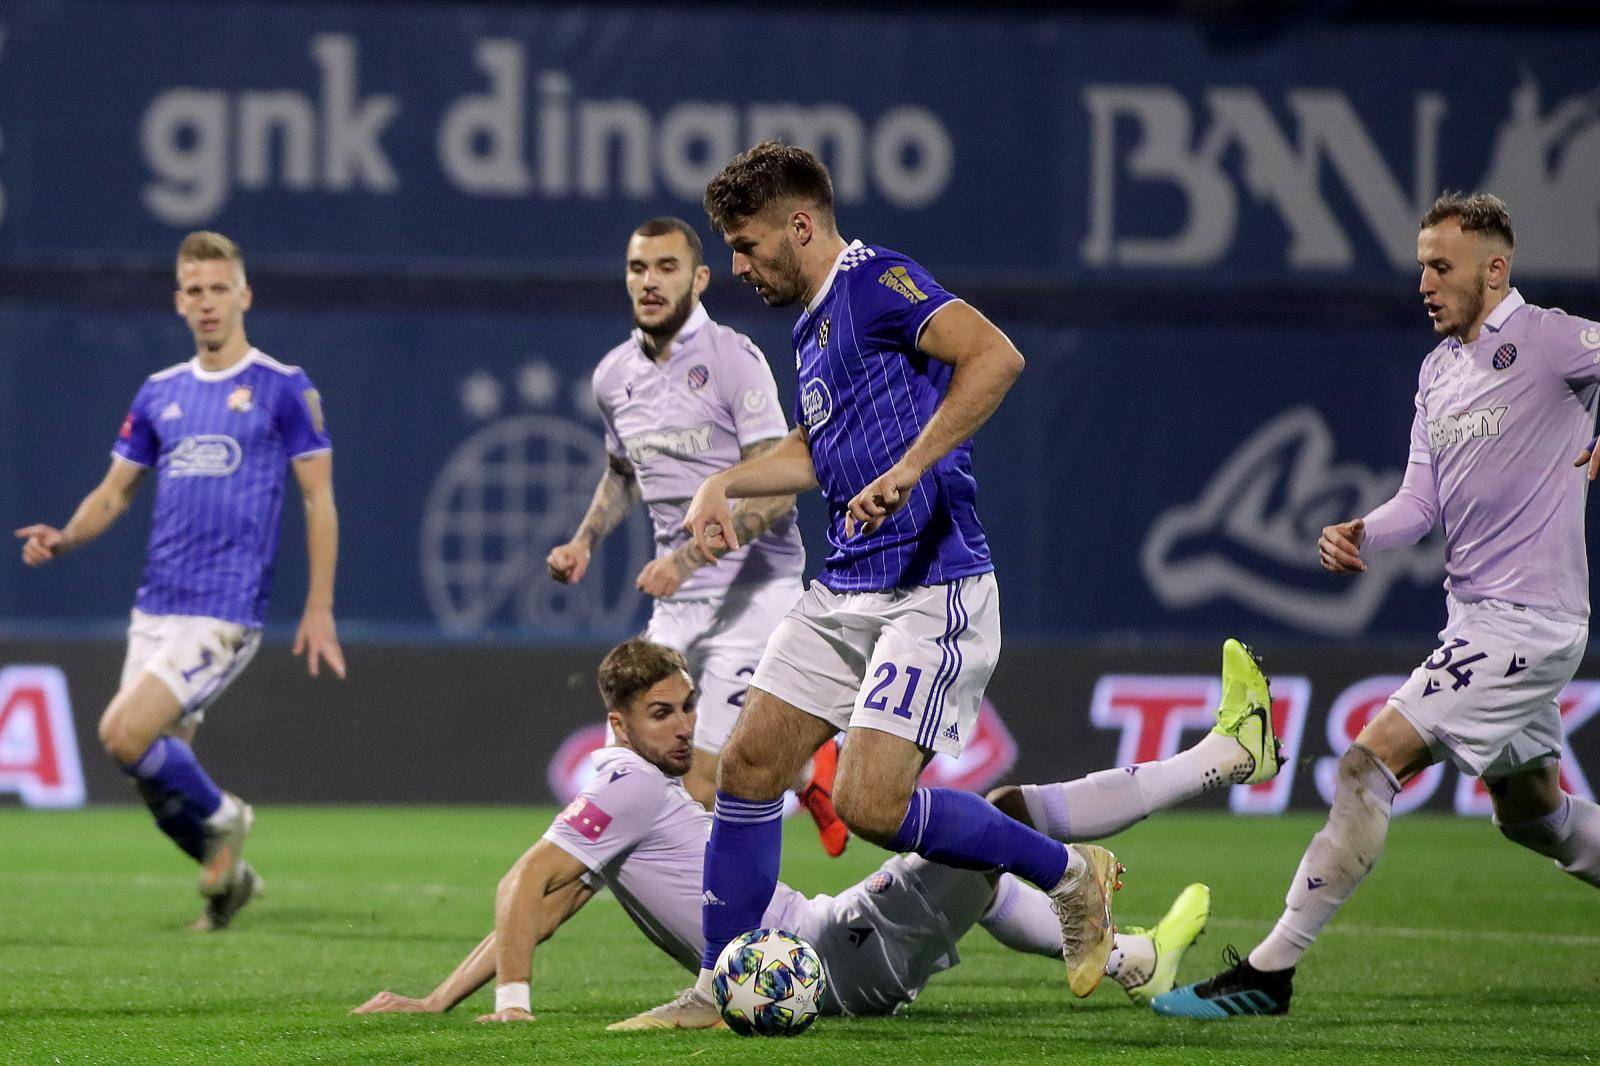 Petkovićeva škola nogometa, igra 'top', a rezultat ipak - flop